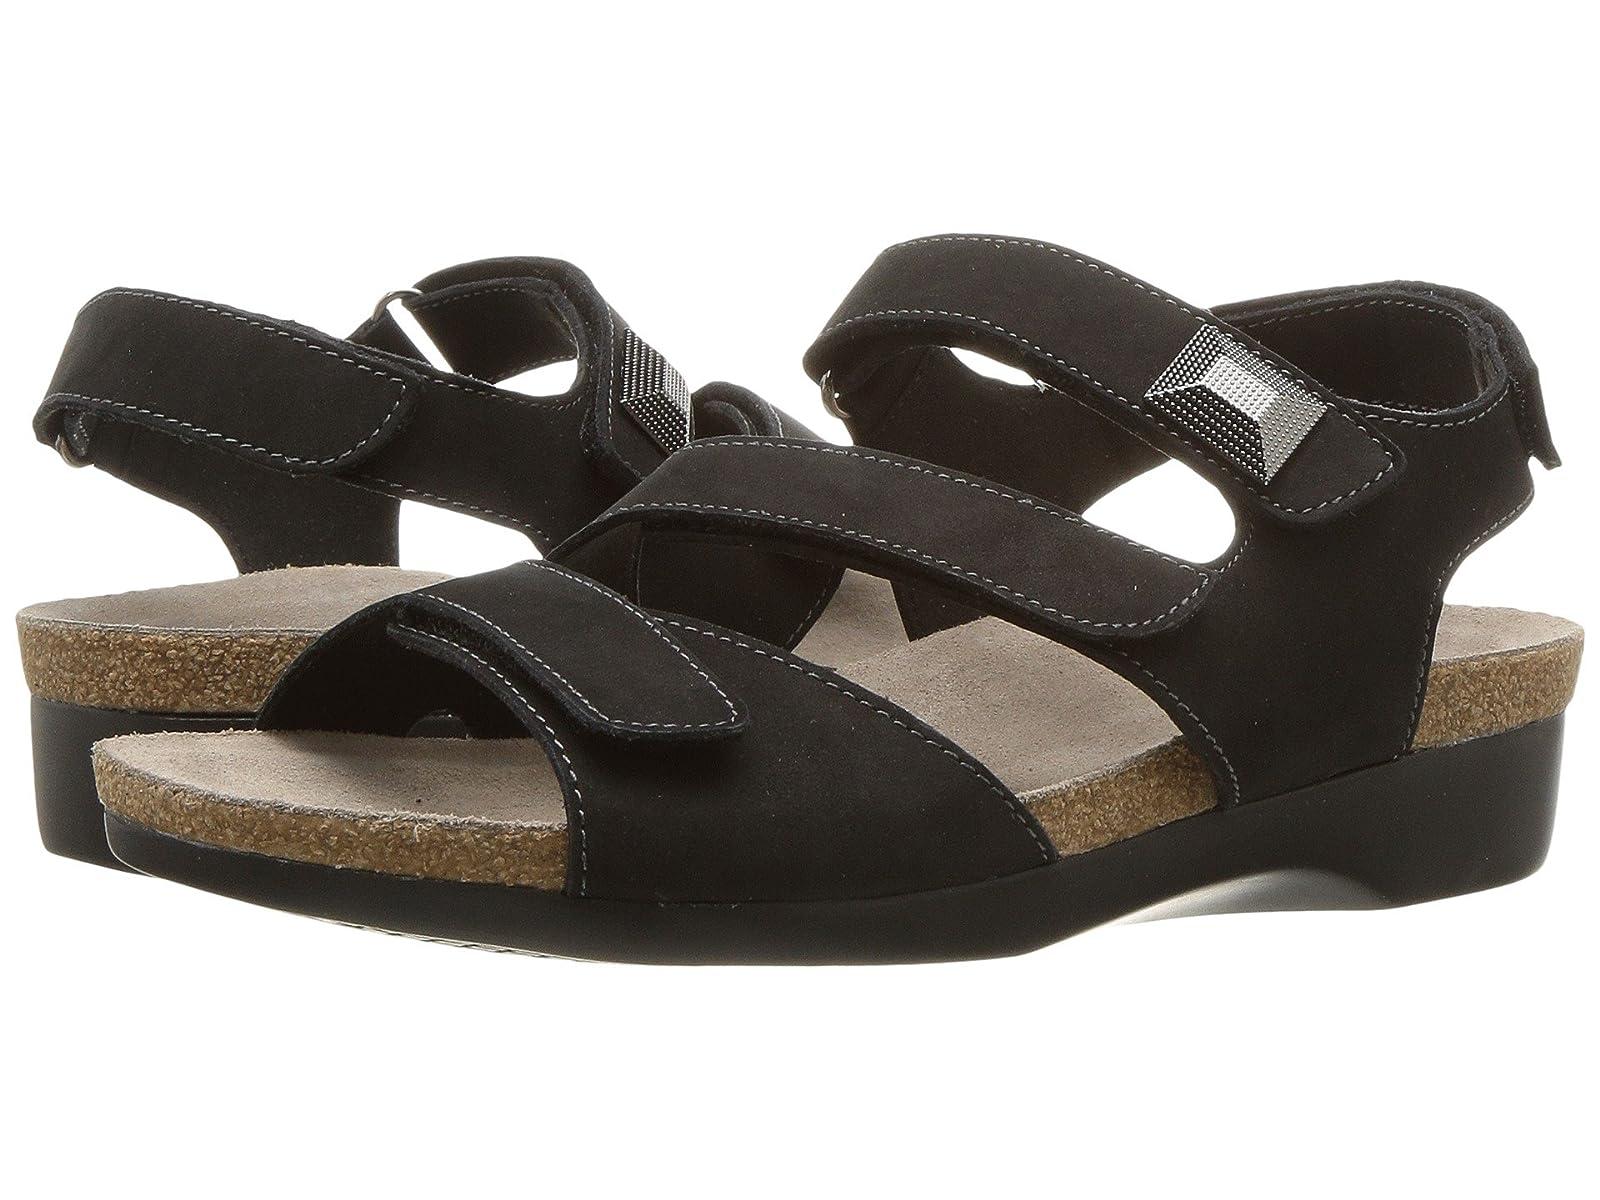 Munro AntilaAtmospheric grades have affordable shoes